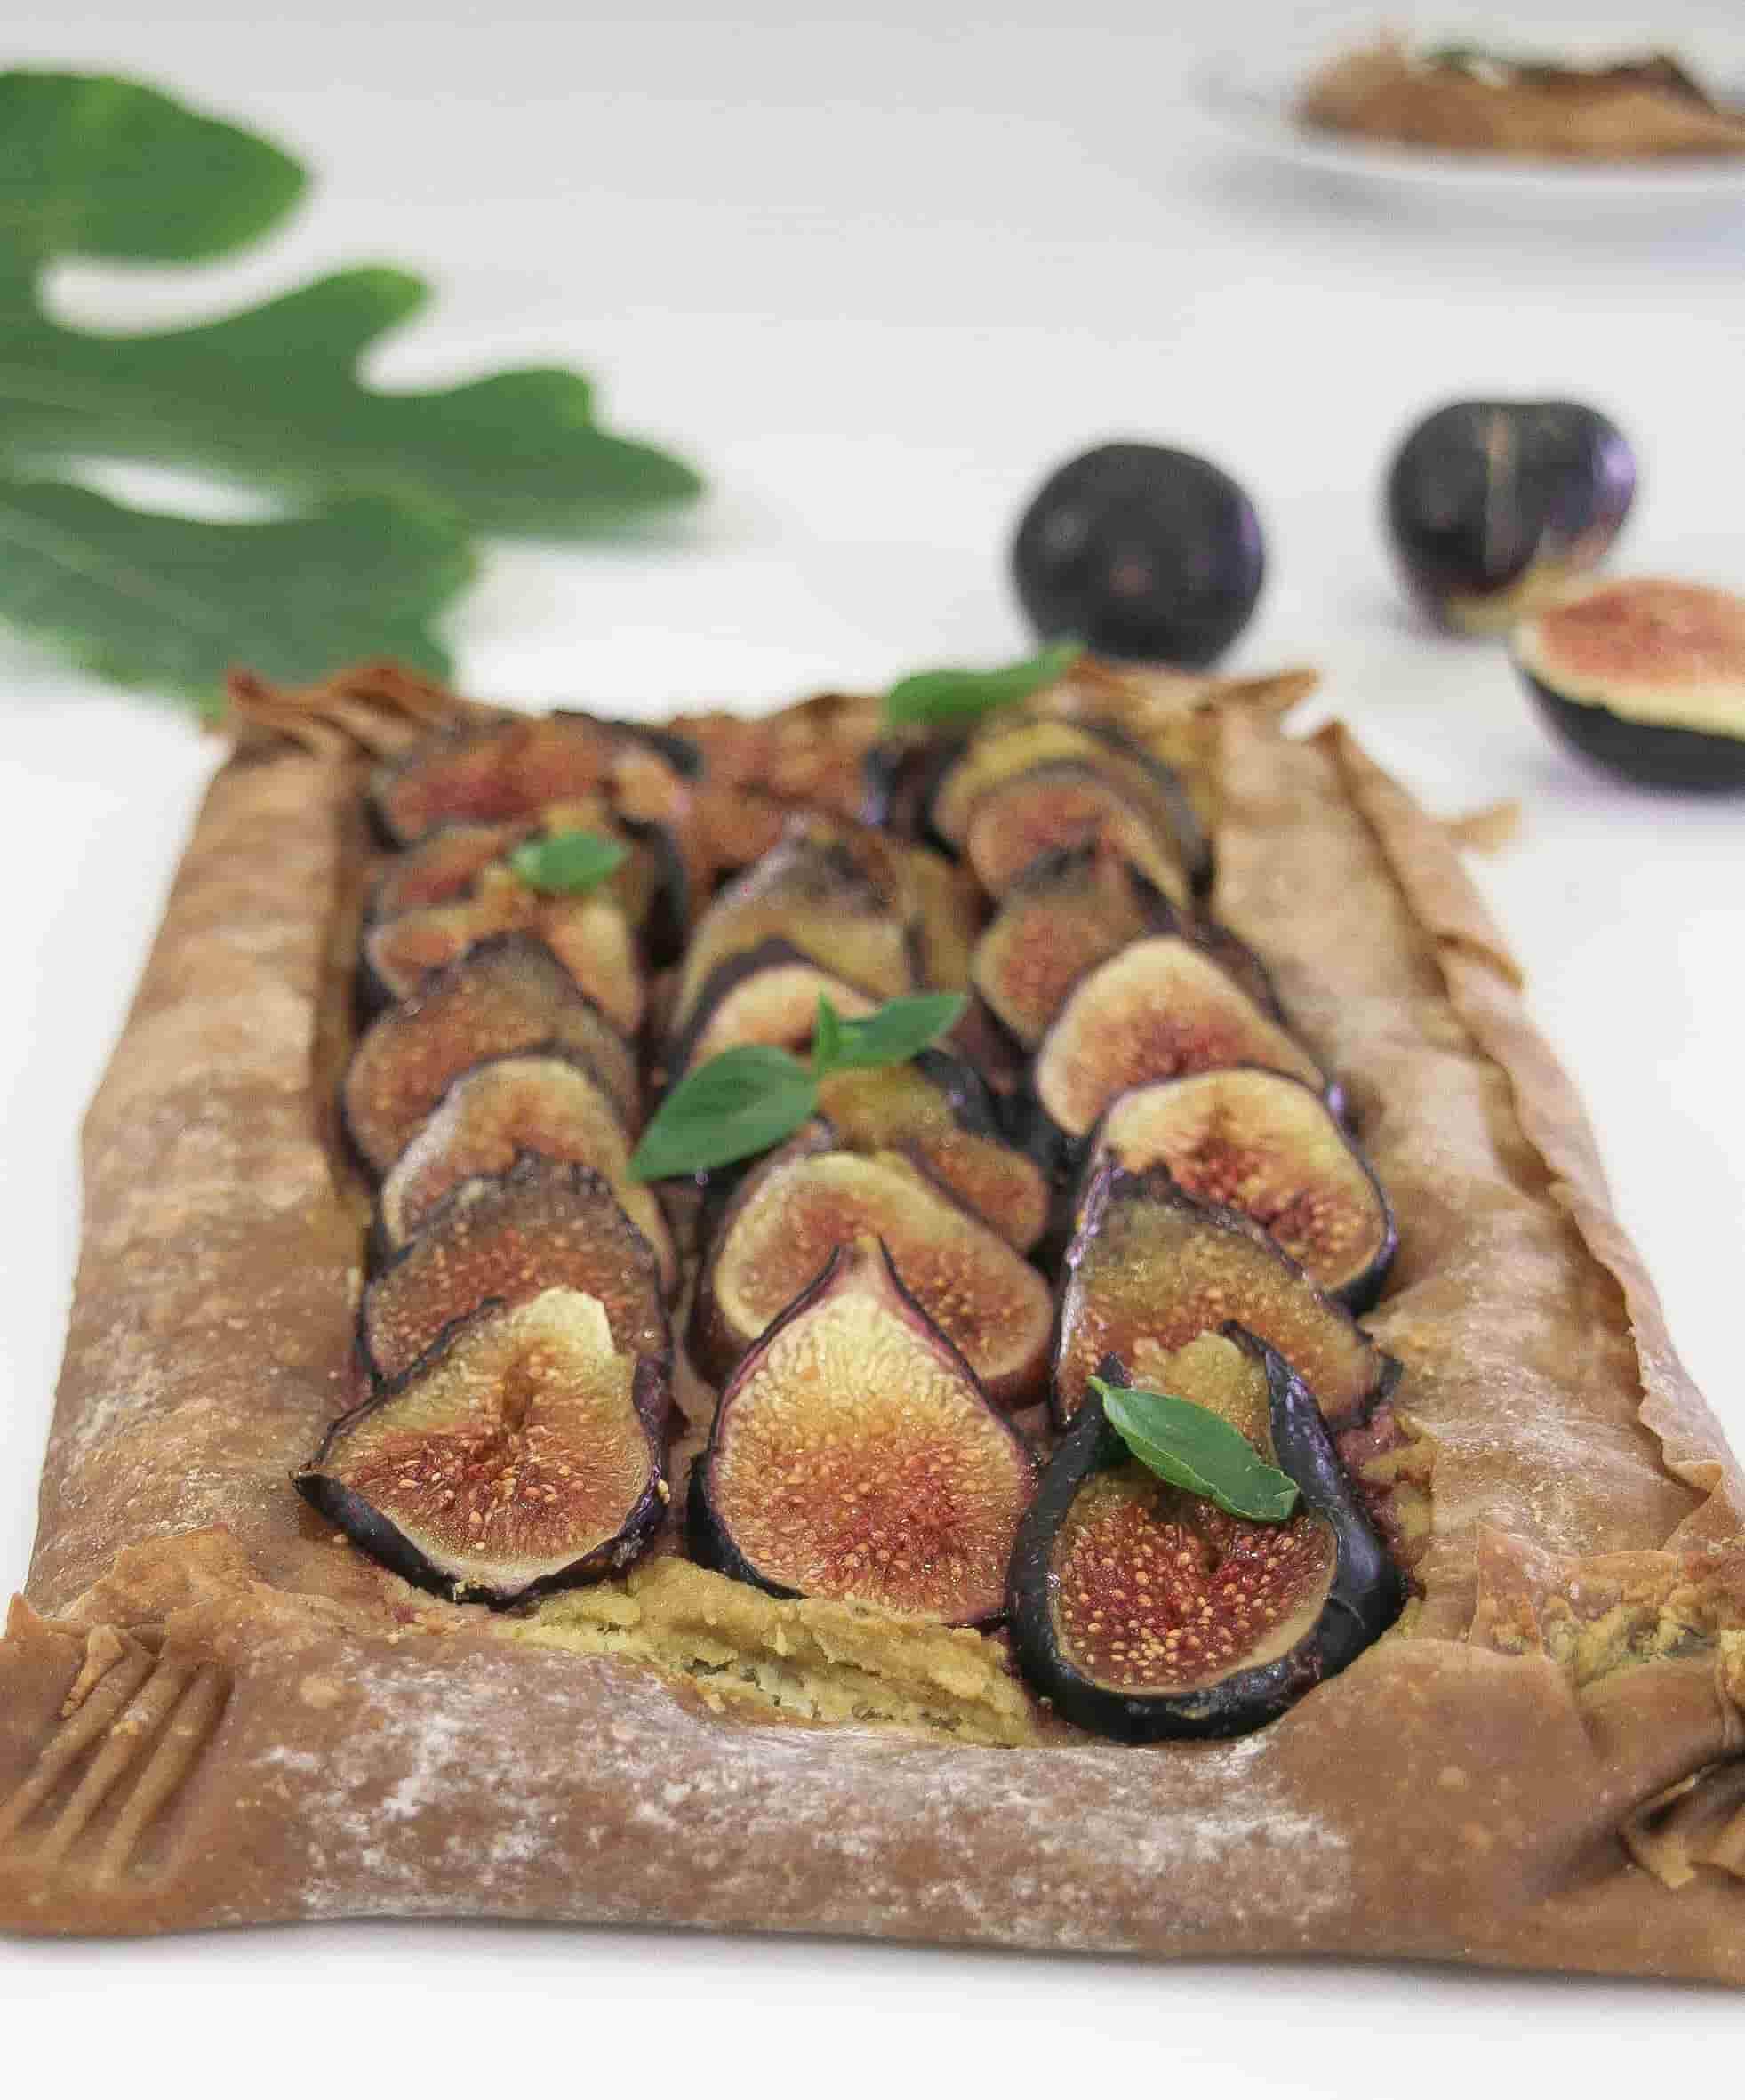 Fig-savoury-tart-vegan-cream-cheese-starters-sides-3